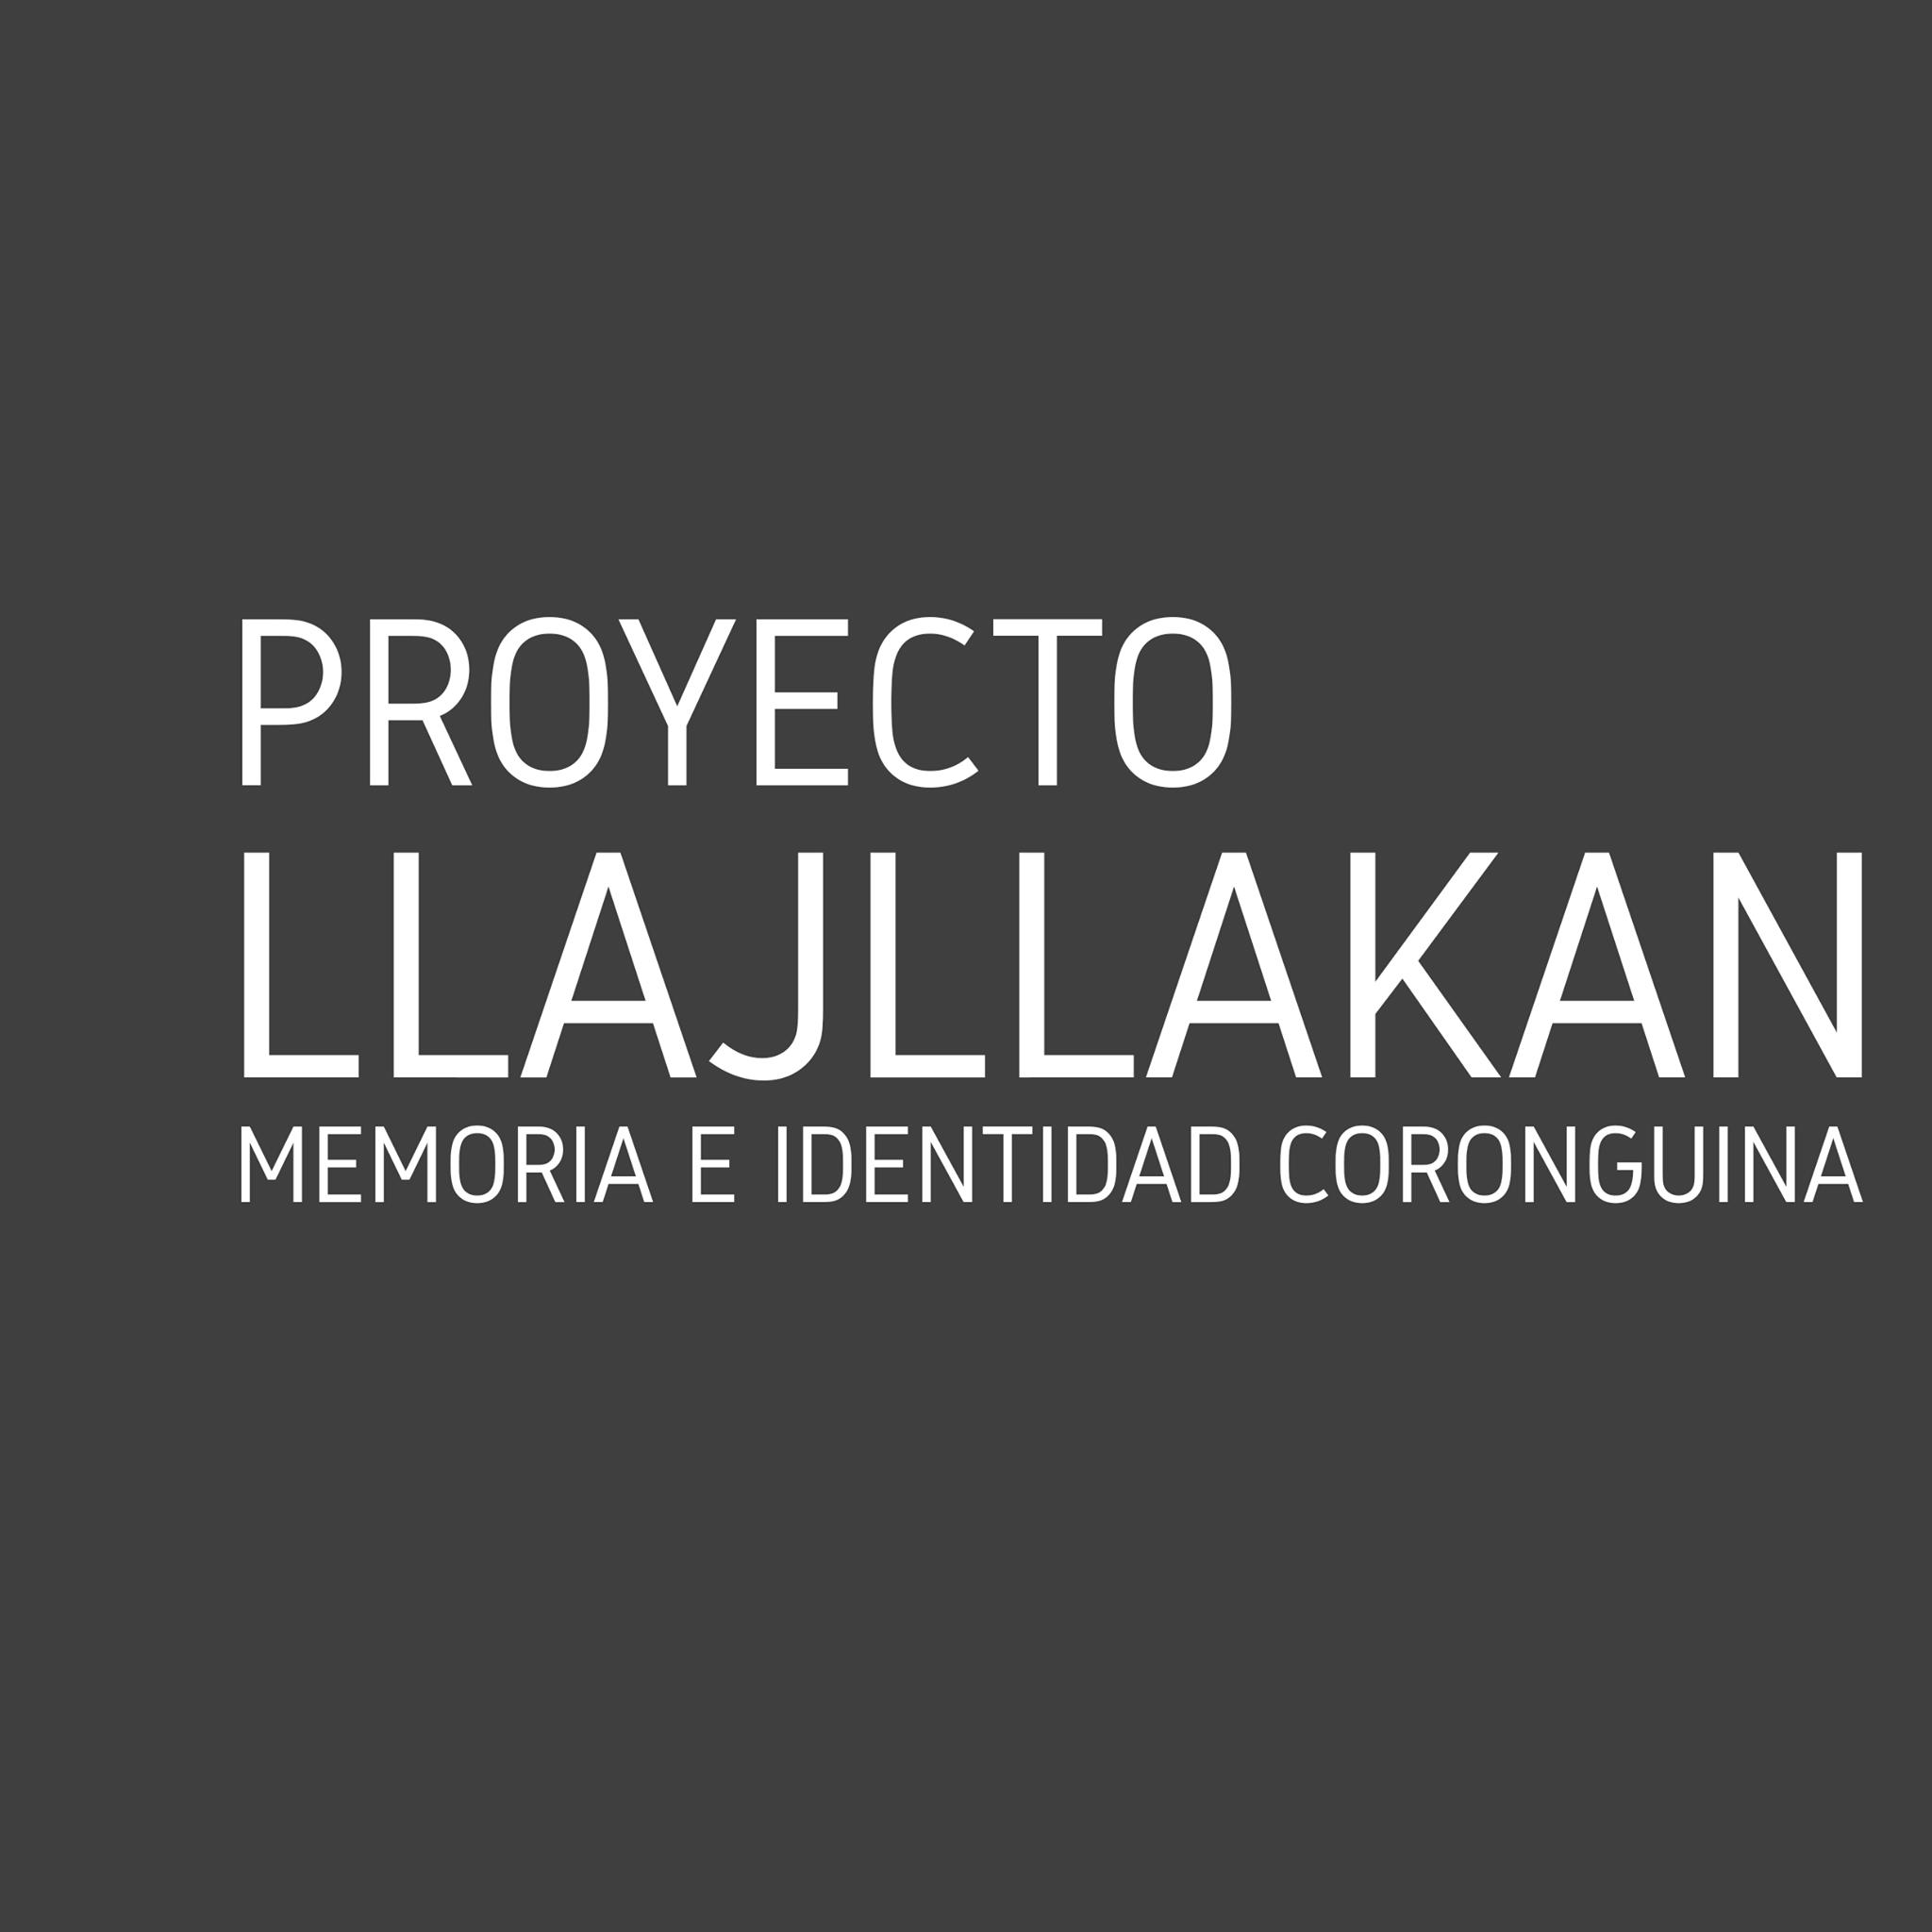 Archivo Llajllakan